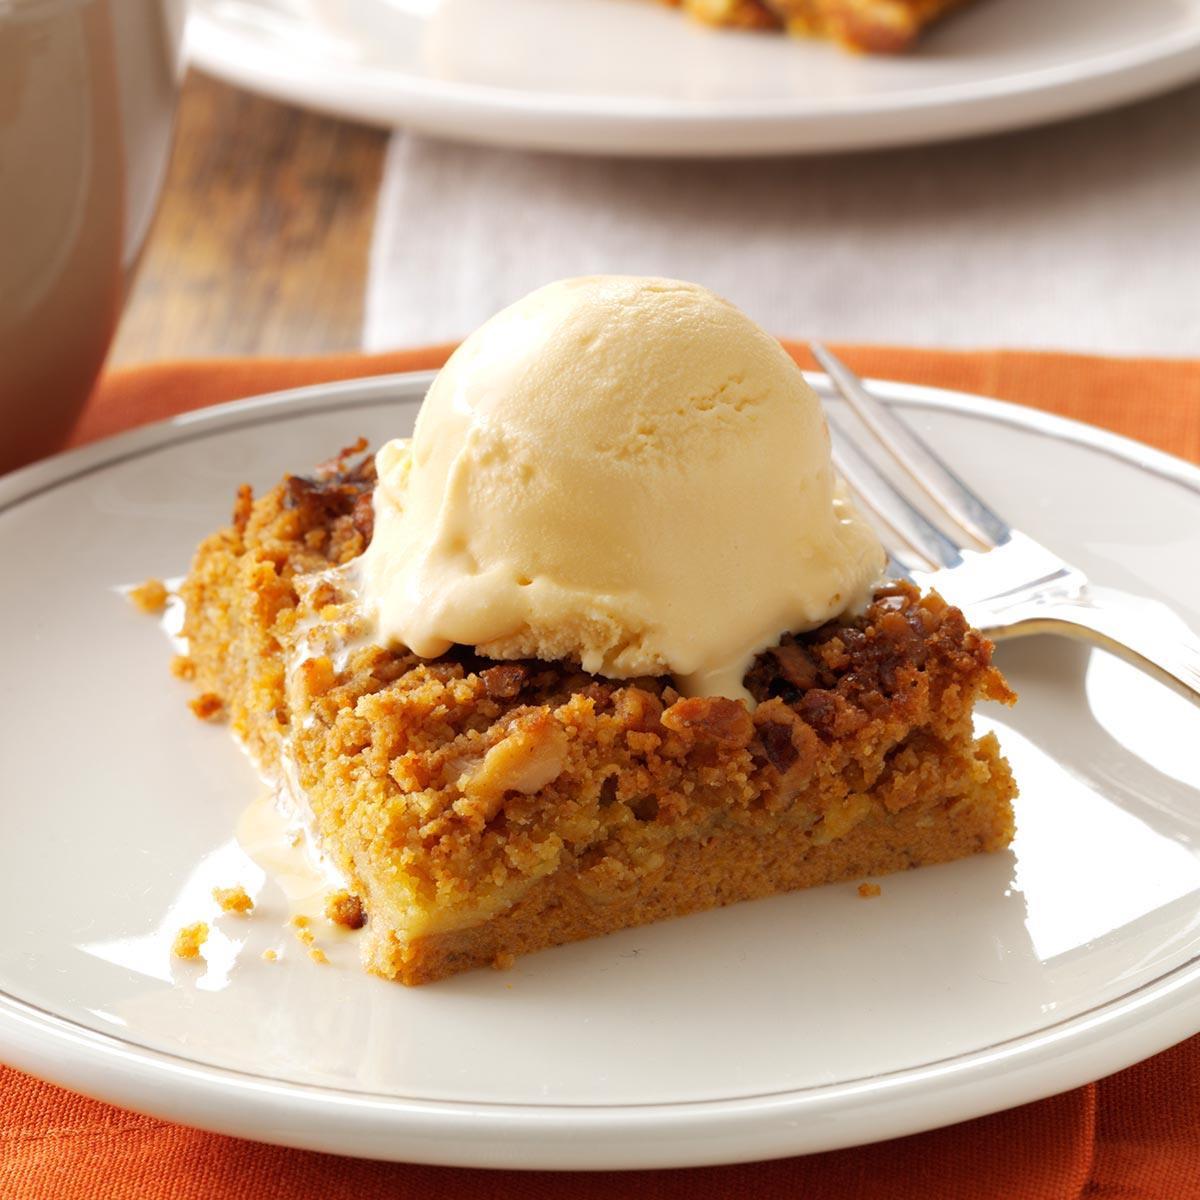 Pumpkin Dessert Recipe Easy  Great Pumpkin Dessert Recipe